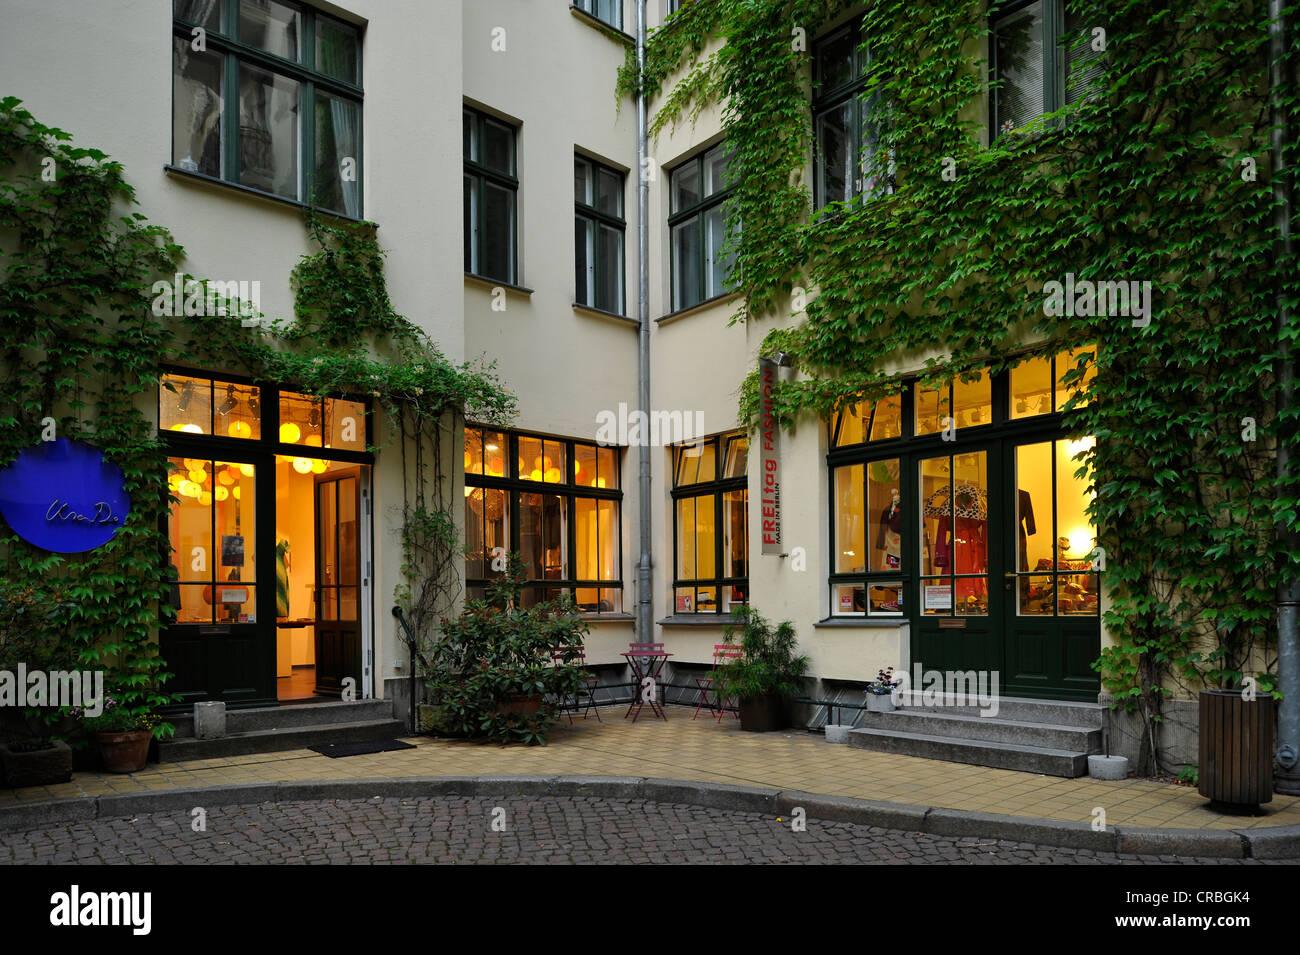 Shop, Hackesche Hoefe courtyards, Mitte district, Berlin, Germany, Europe - Stock Image